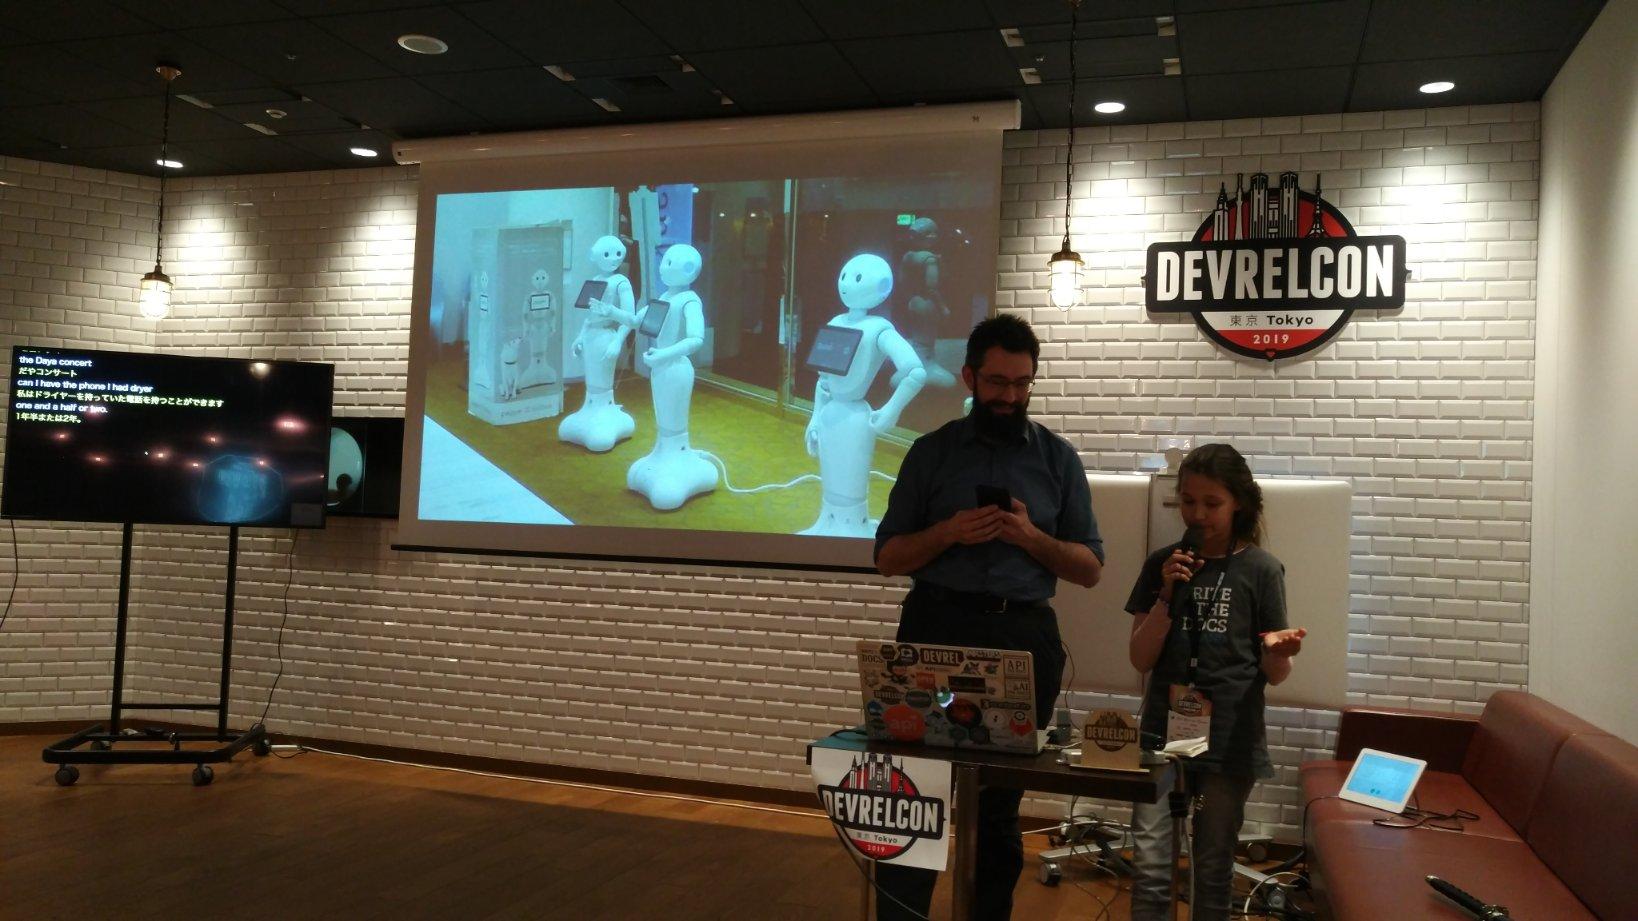 Freya and Kristof Van Tomme on using DevRel to help combat climate change